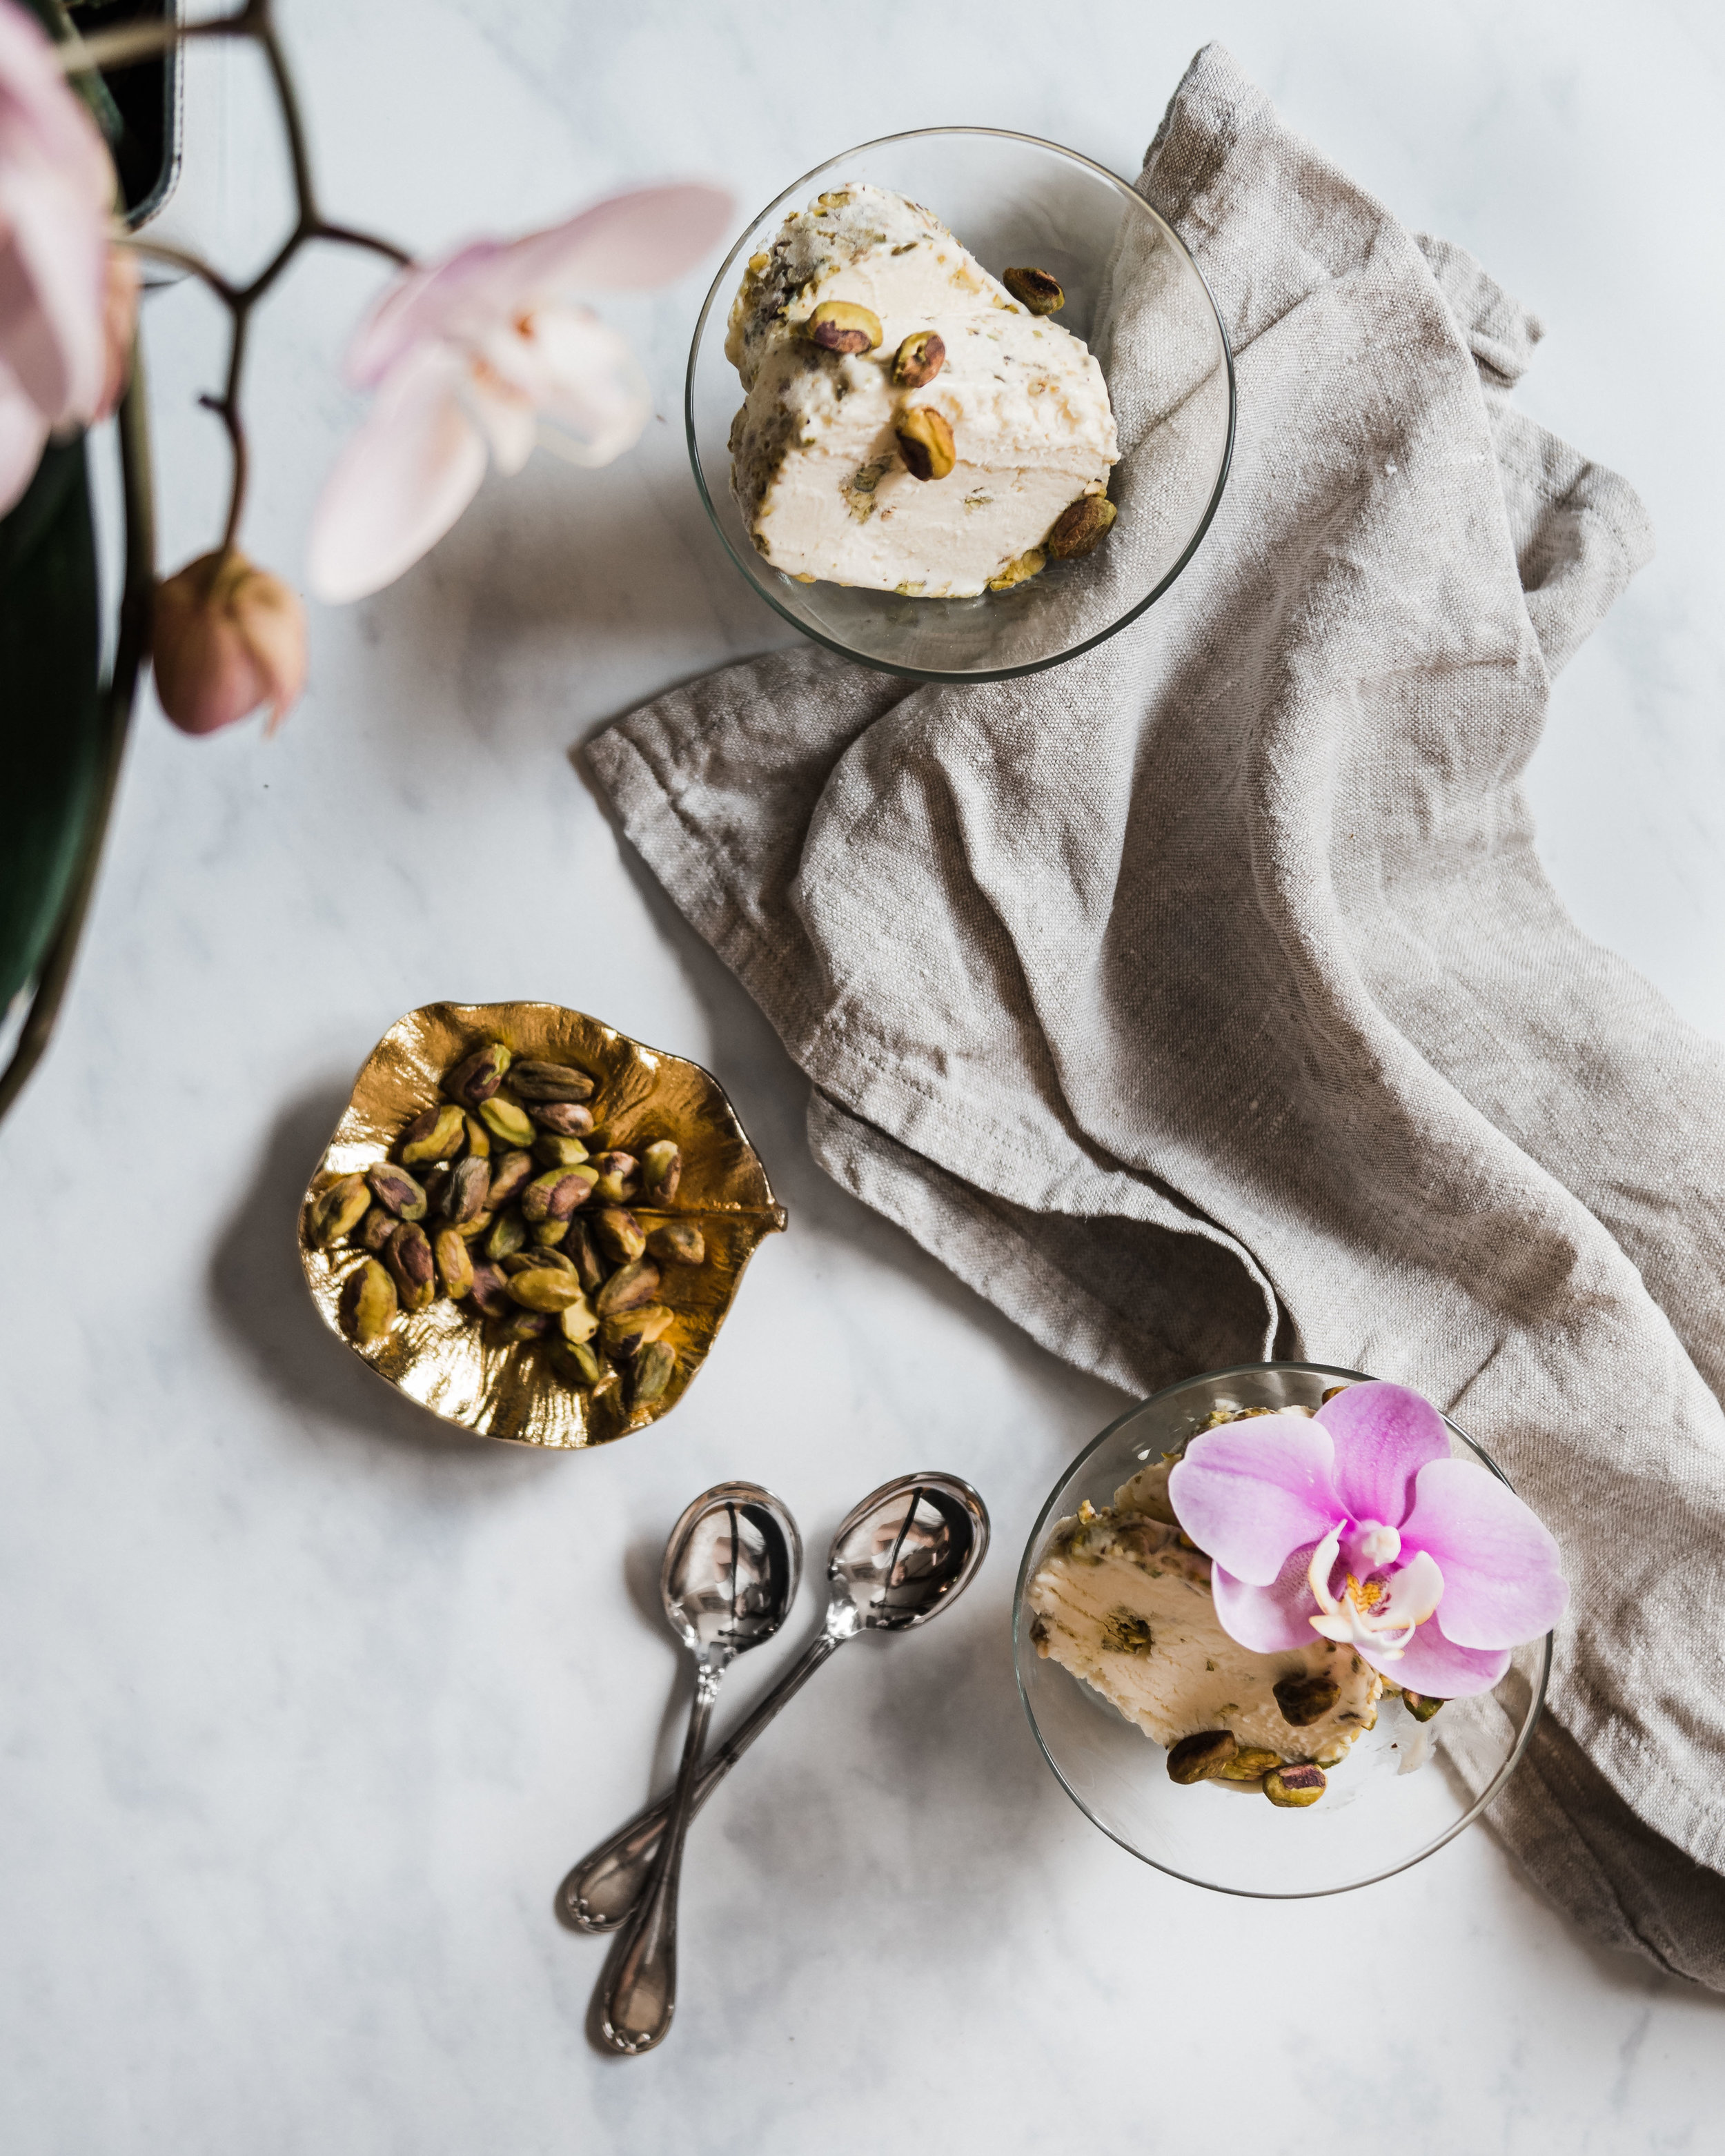 Syrian Mastic Ice Cream with Pistachios (Bakdash)